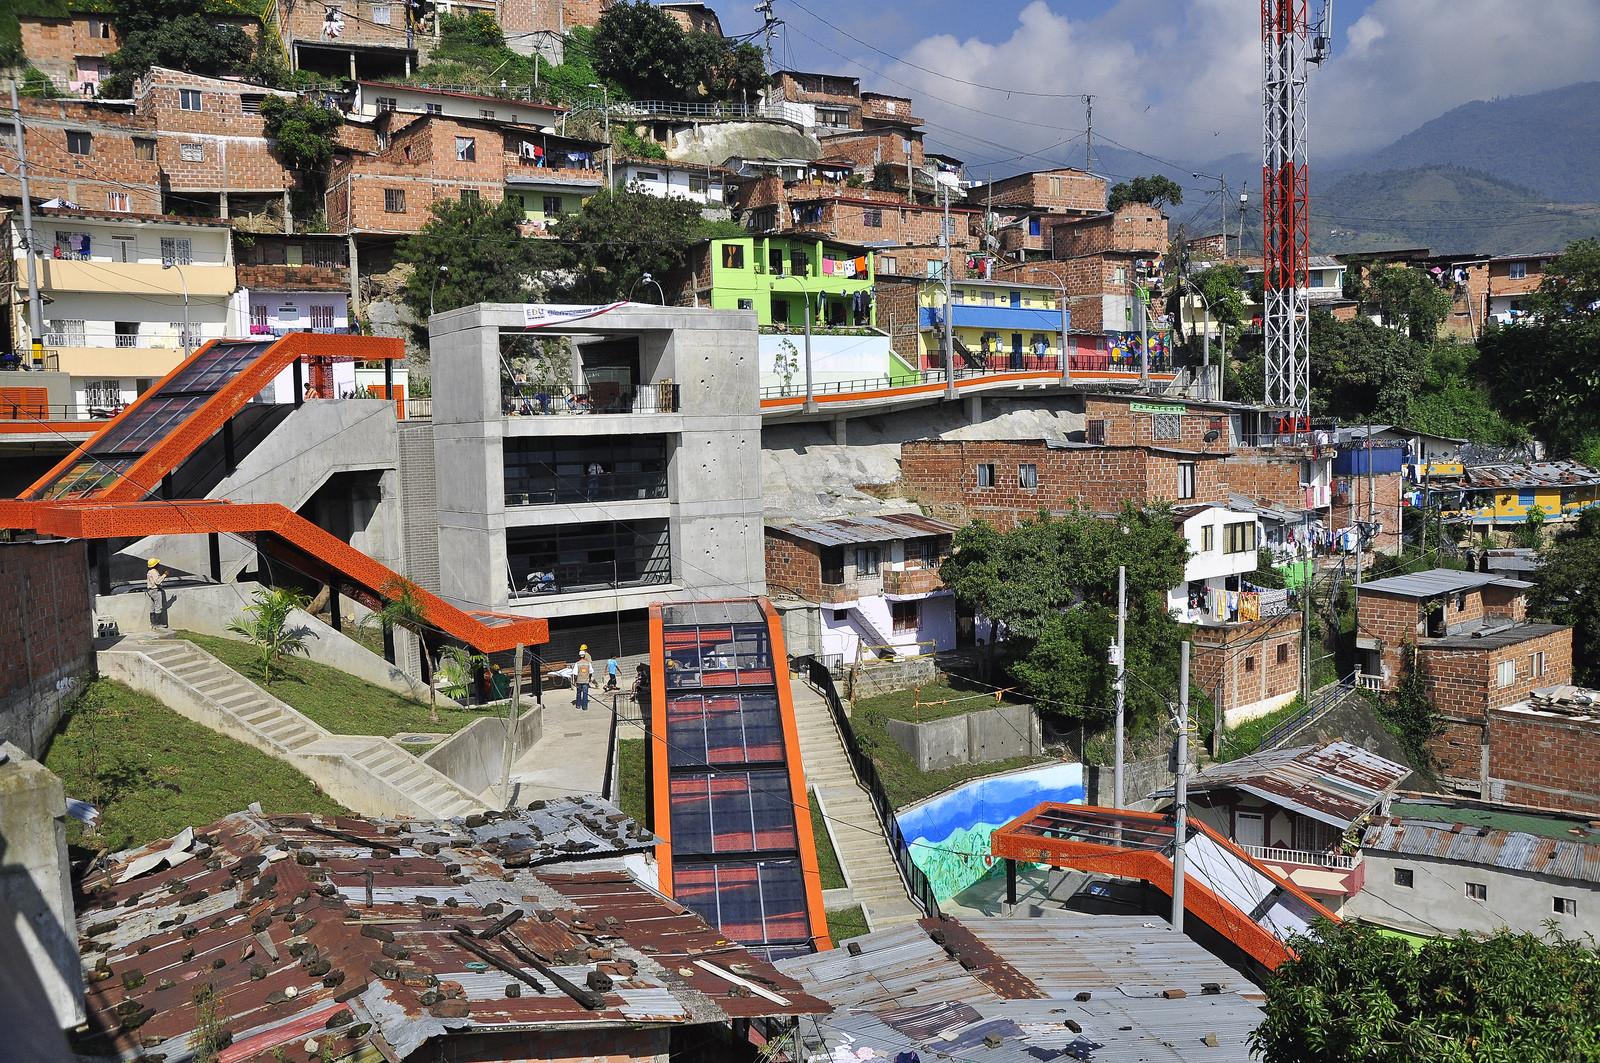 Comuna 13, architect Medelliěn Empresa de Desarrolla Urbana (EDU). Imagen Cortesía de EMBARQ Brasil